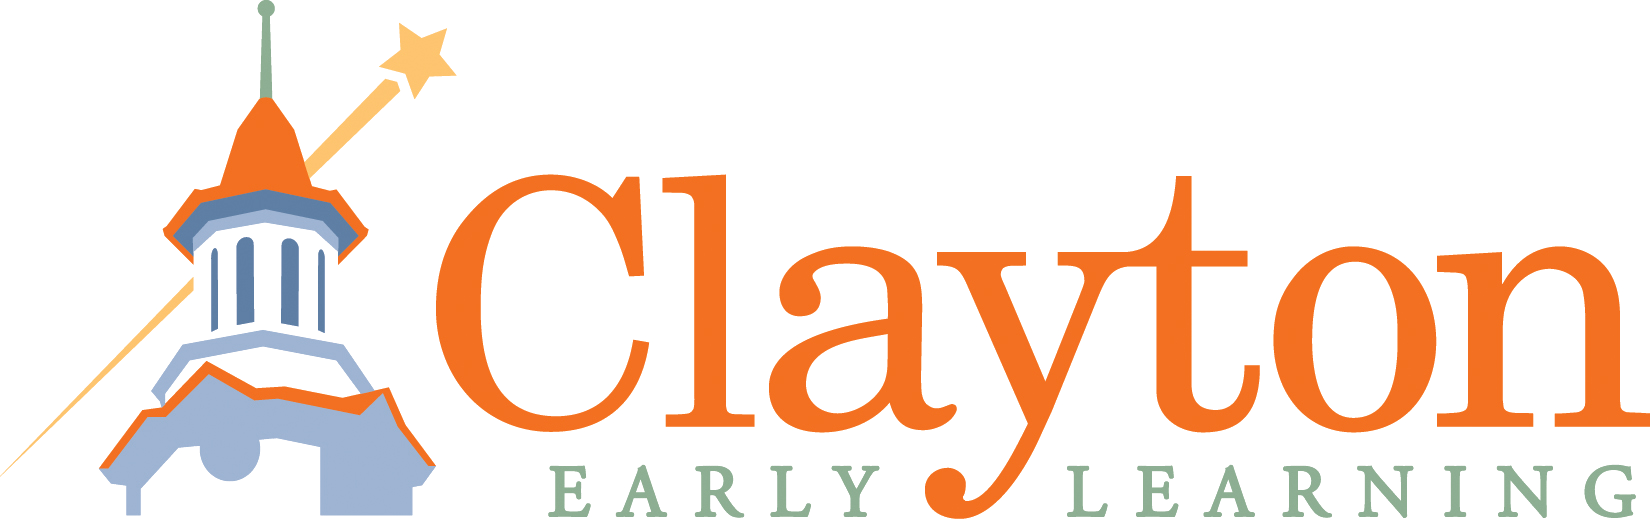 Clayton Early Learning logo